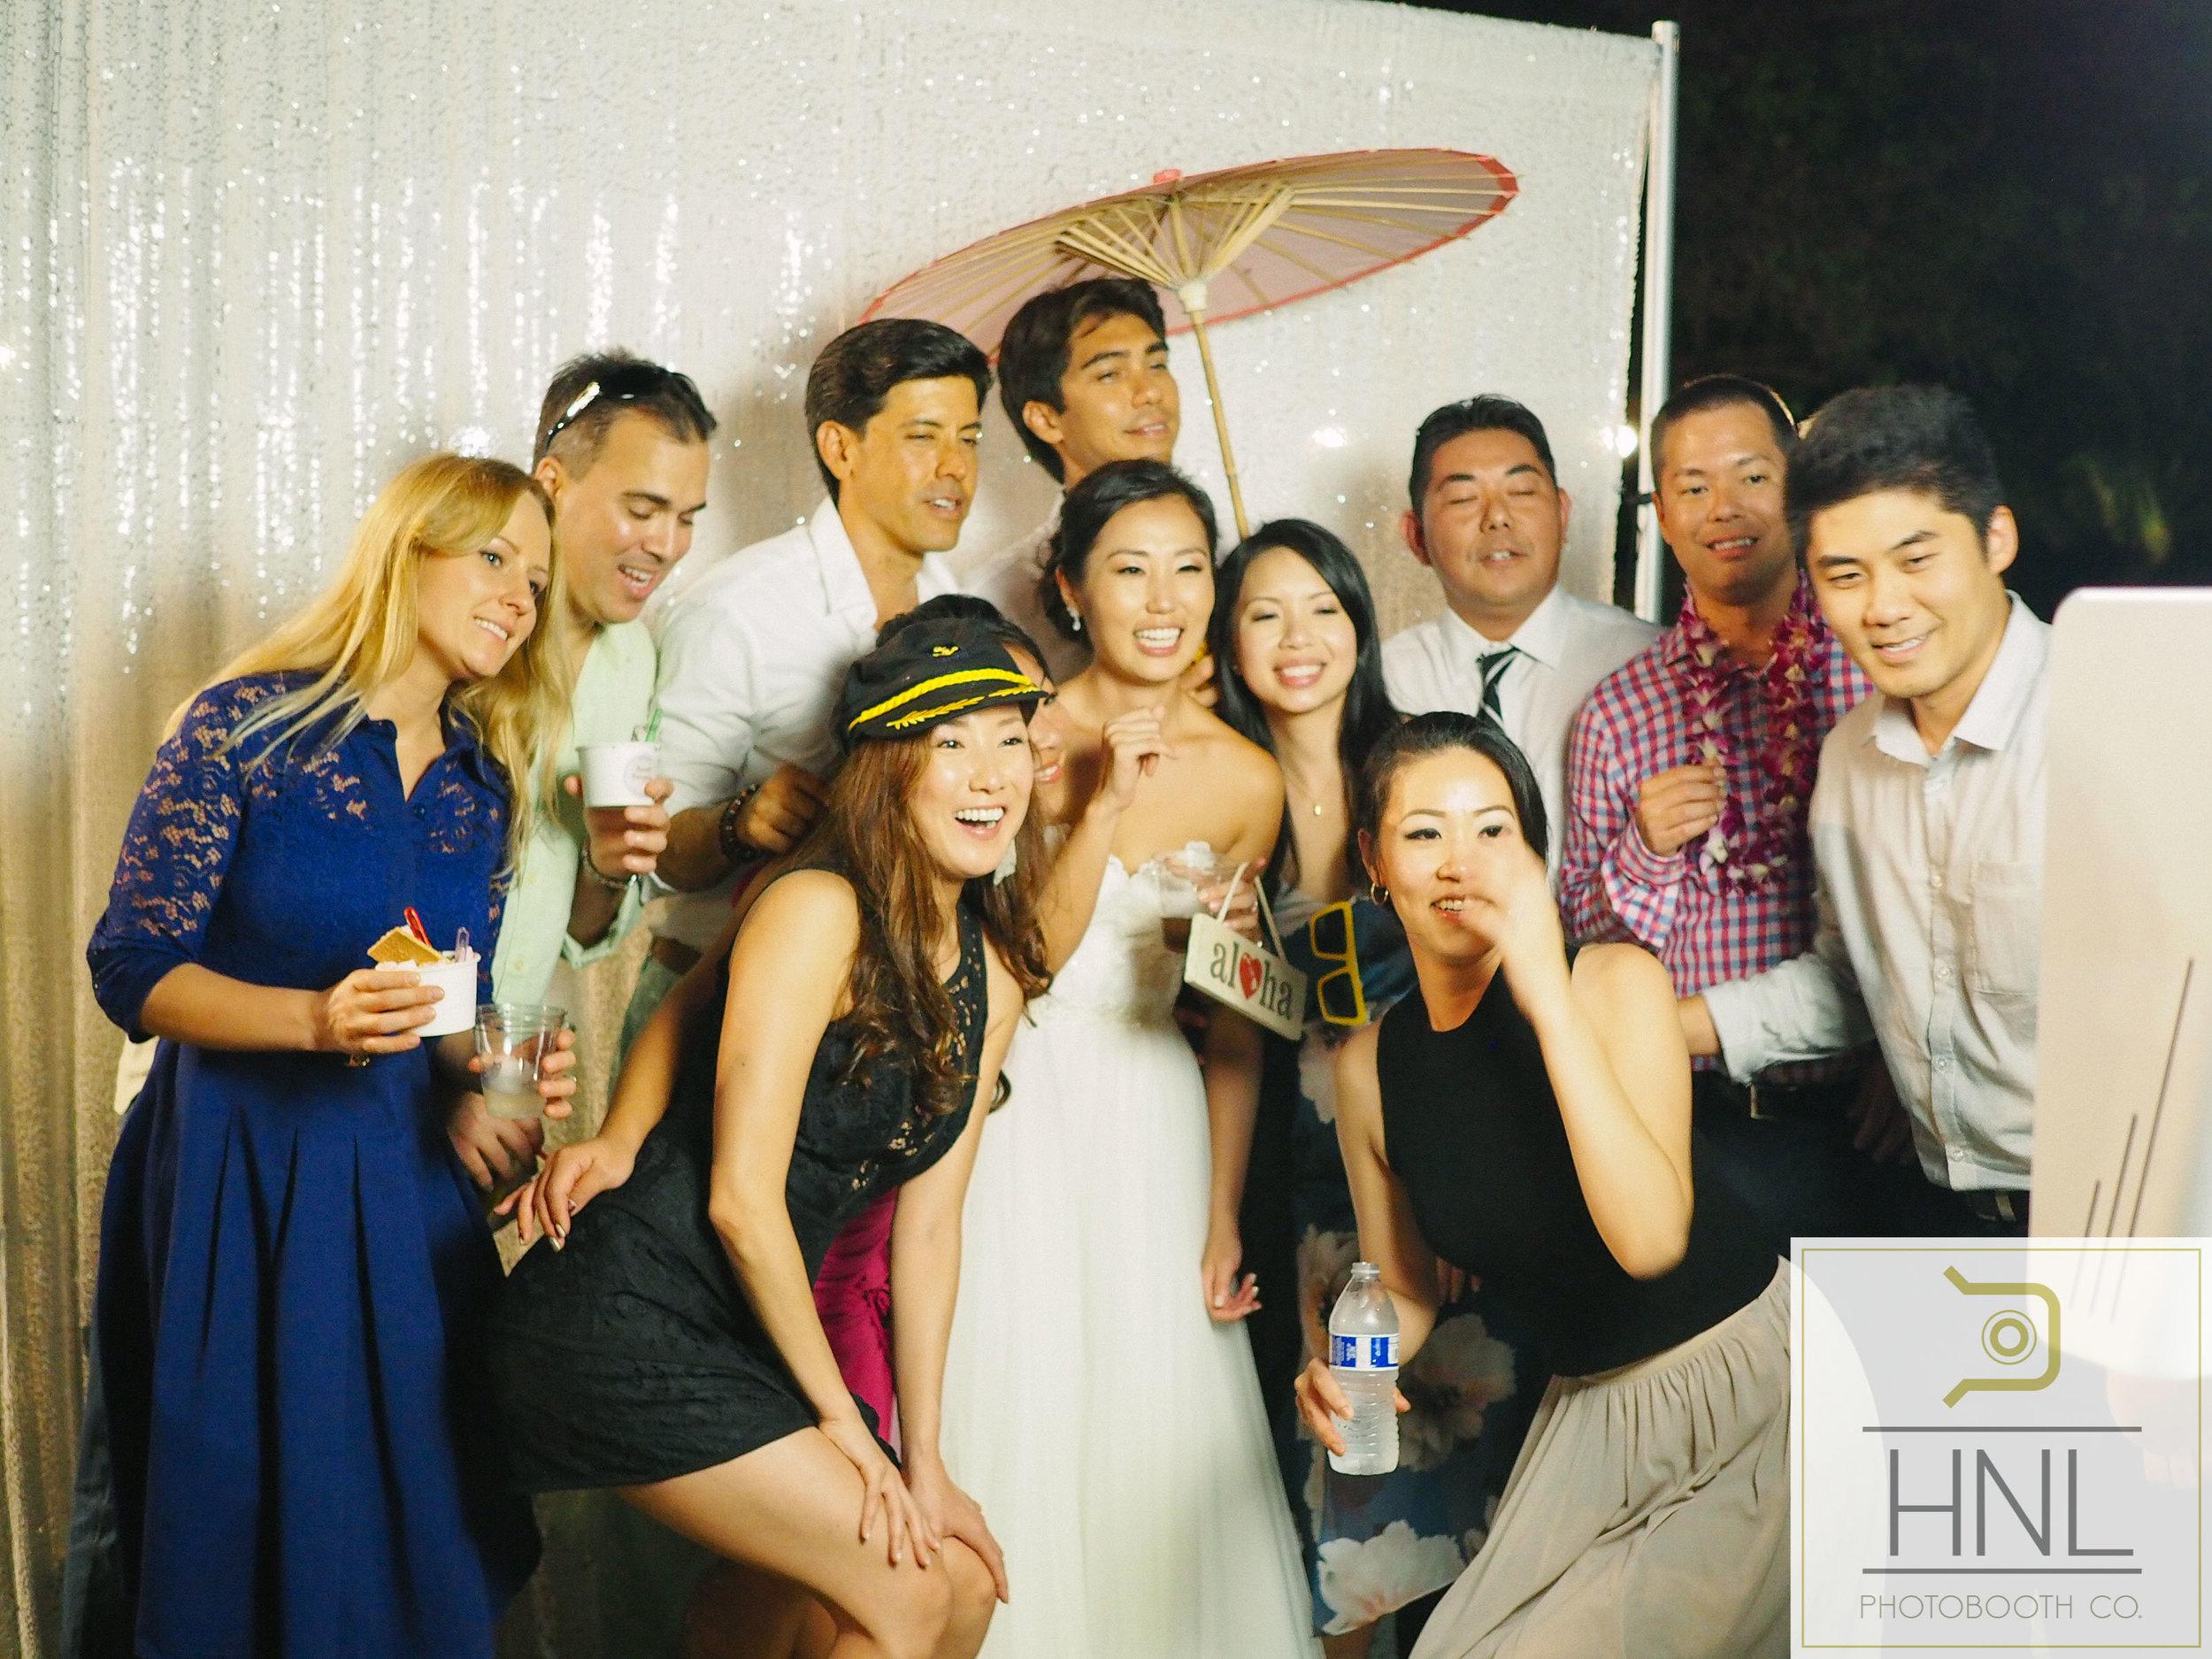 Miki and Dan wedding photo booth lanikohonua ko olina kapolei Oahu Hawaii -10.jpg